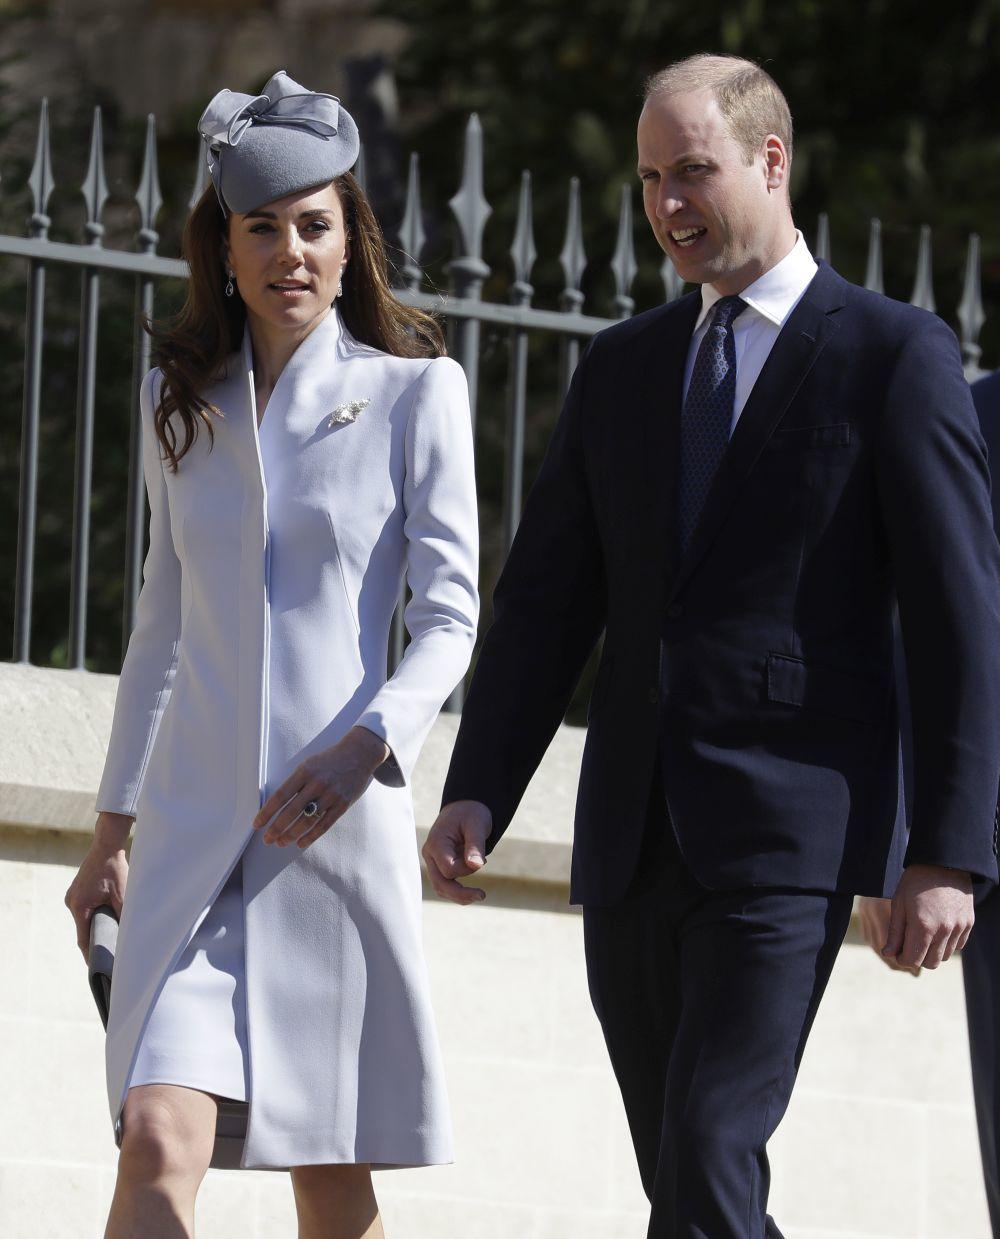 Los Duques de Cambridge llegando a la capilla de San Jorge.